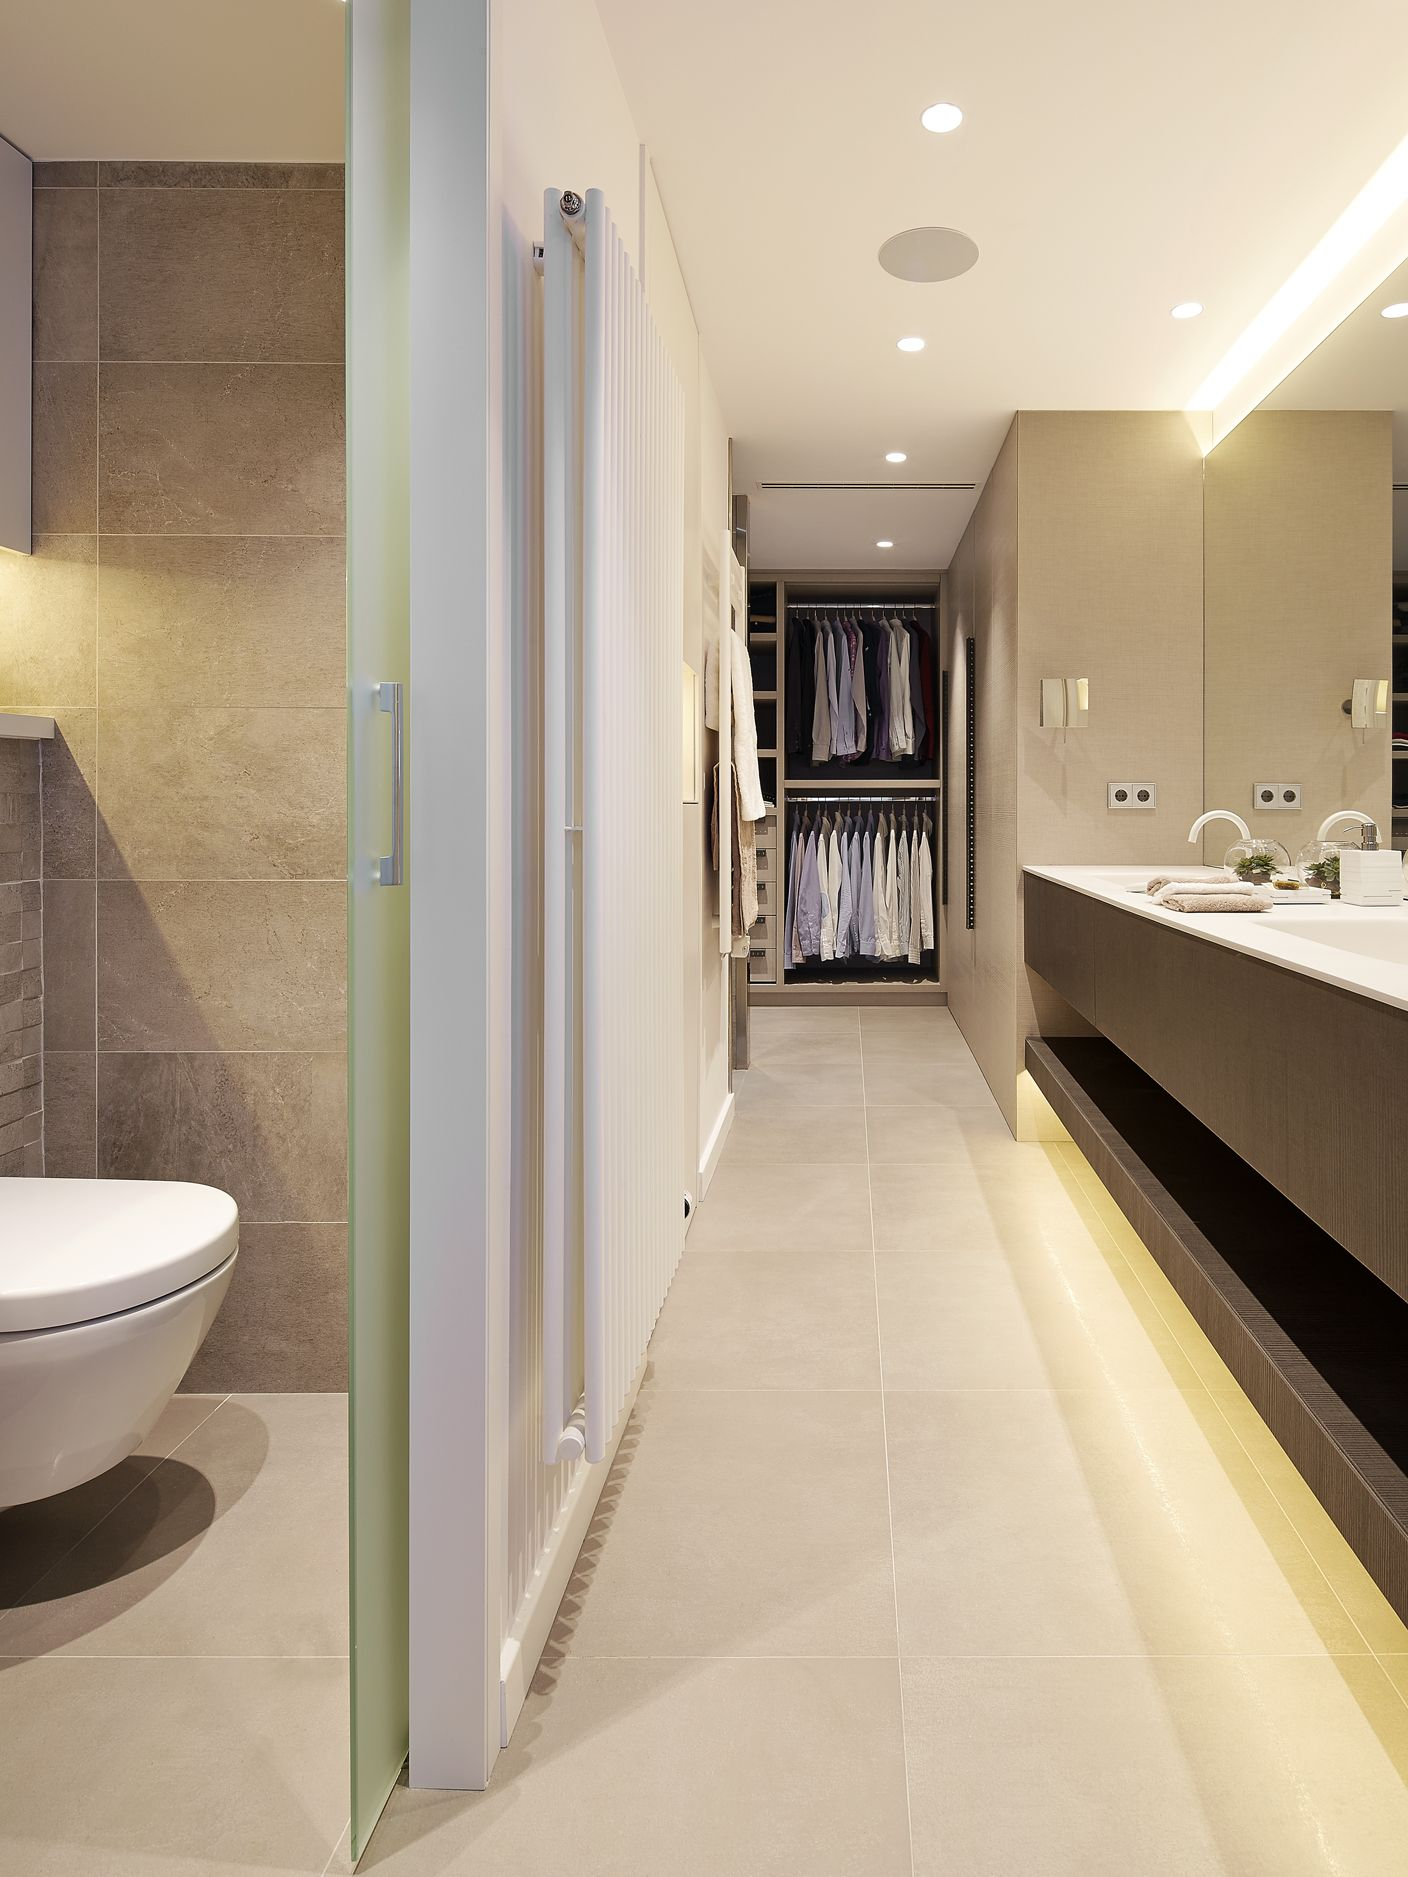 Molins interiors arquitectura interior interiorismo dormitorio principal suite ba o - Arquitectura interior ...